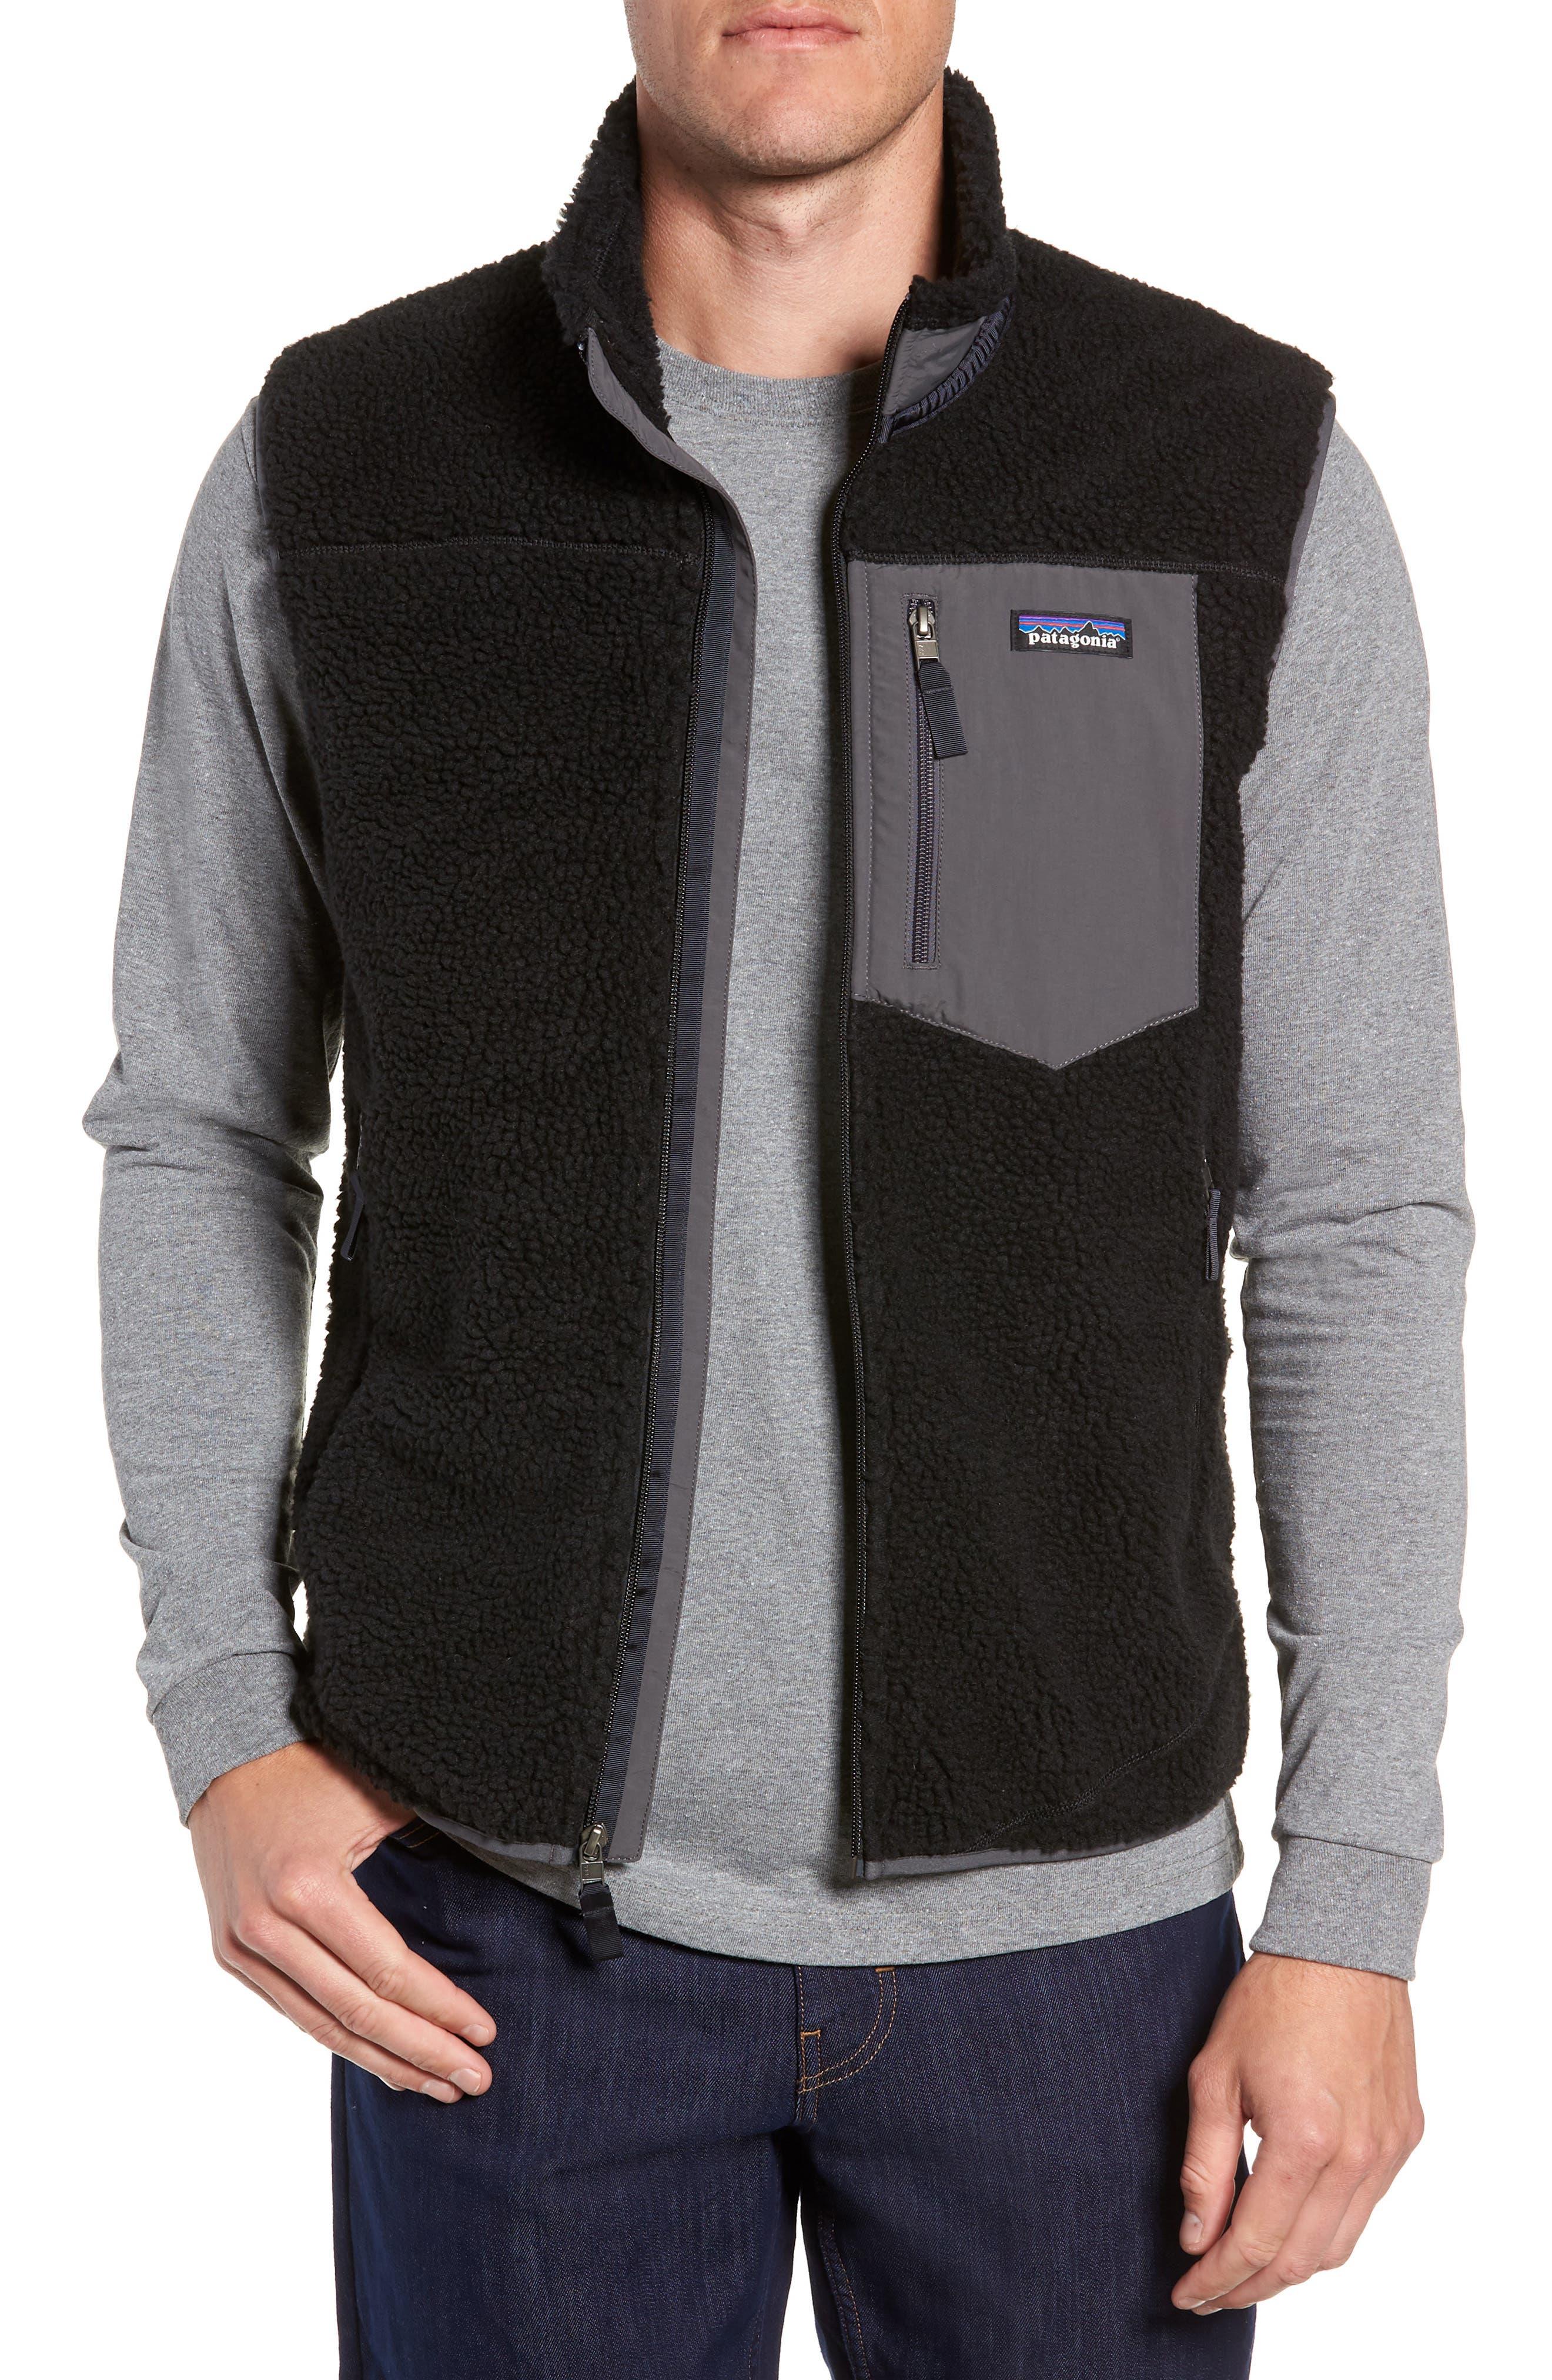 Classic Retro-X<sup>®</sup> Windproof Vest,                         Main,                         color, 002